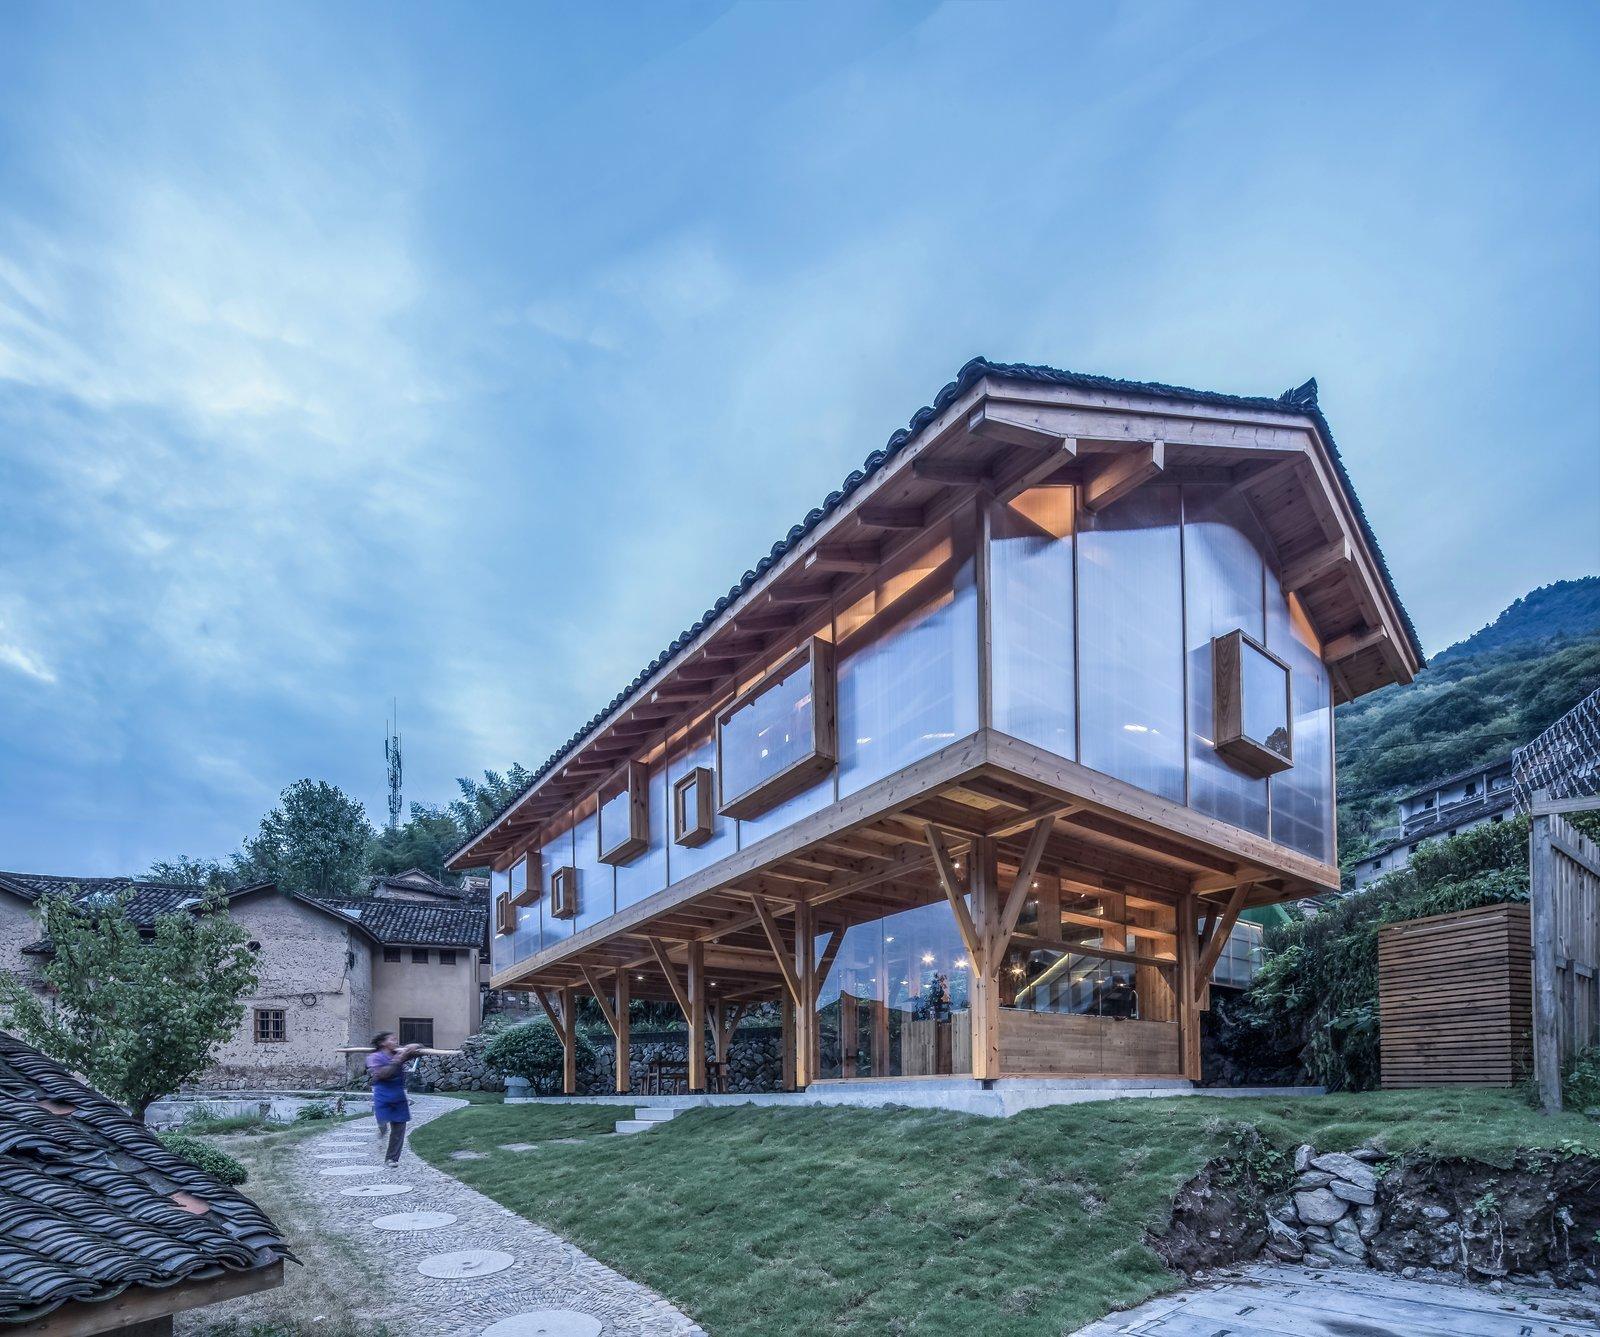 Mountain House in Mist